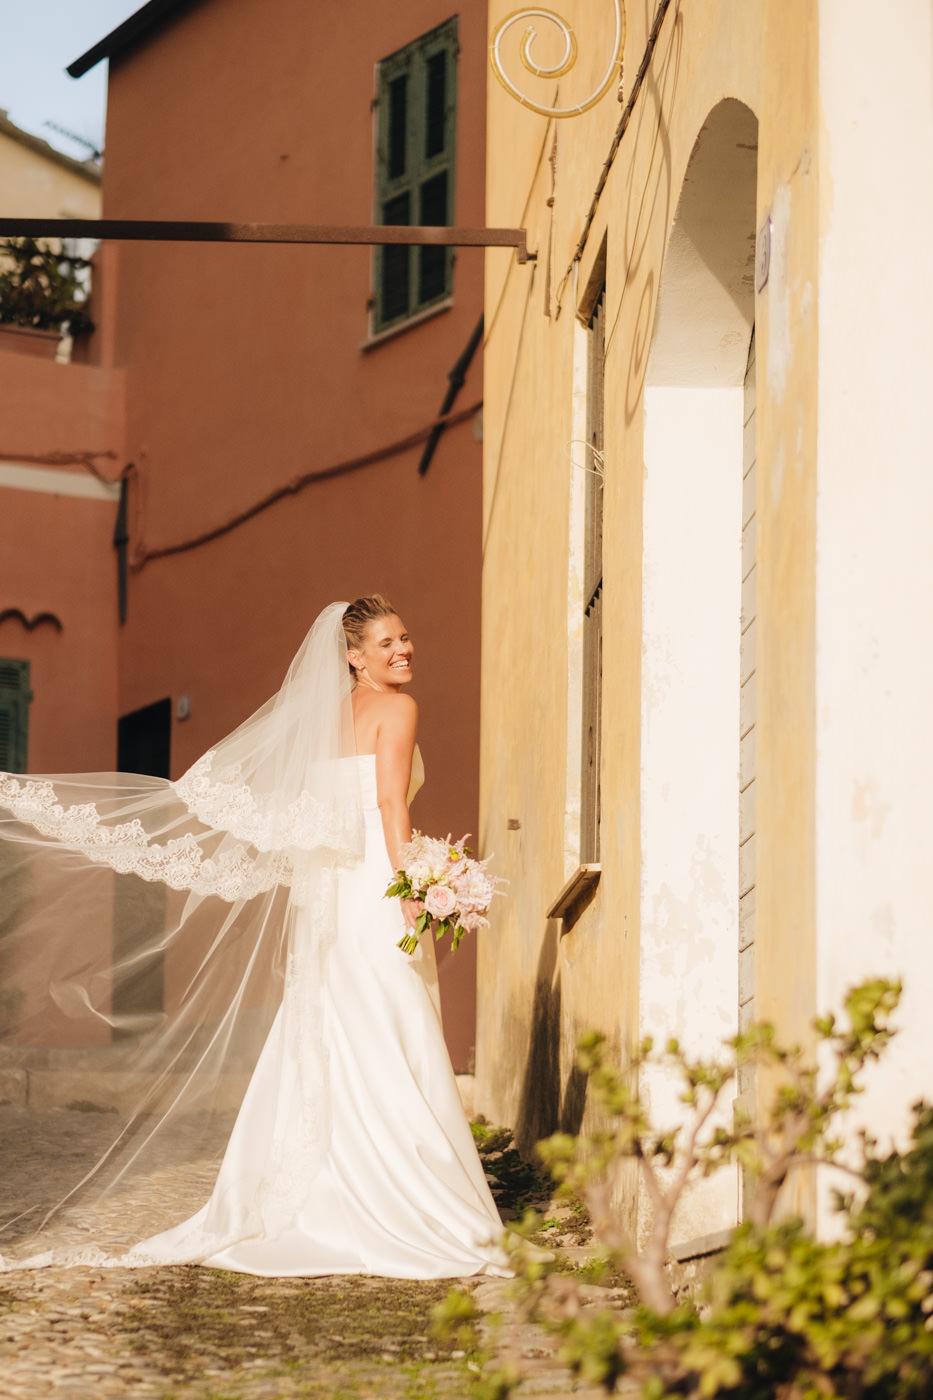 matrimoni_all_italiana_fotografo_matrimonio_cinque_terre-52.jpg